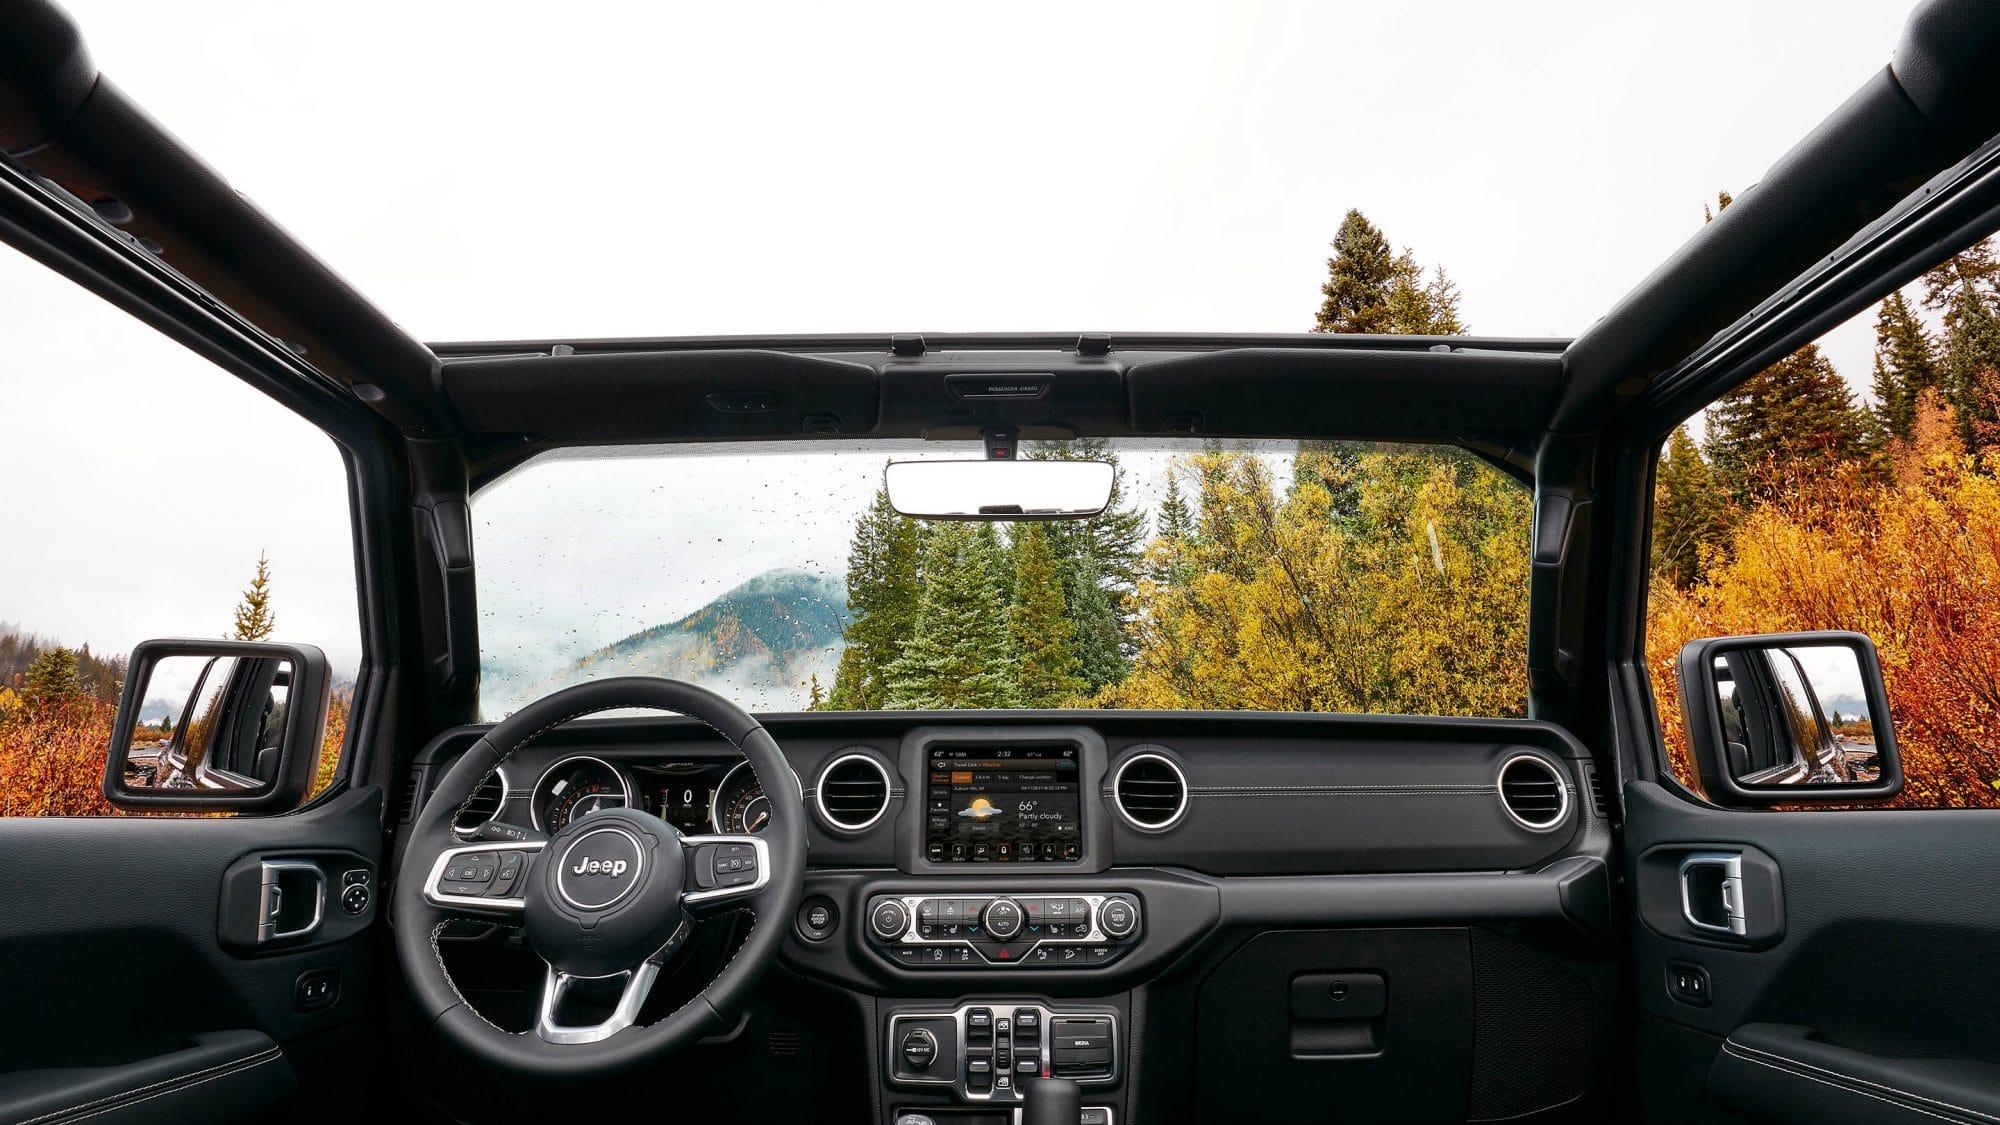 New 2018 jeep all new wrangler for sale near murrieta ca for Jeep wrangler interior